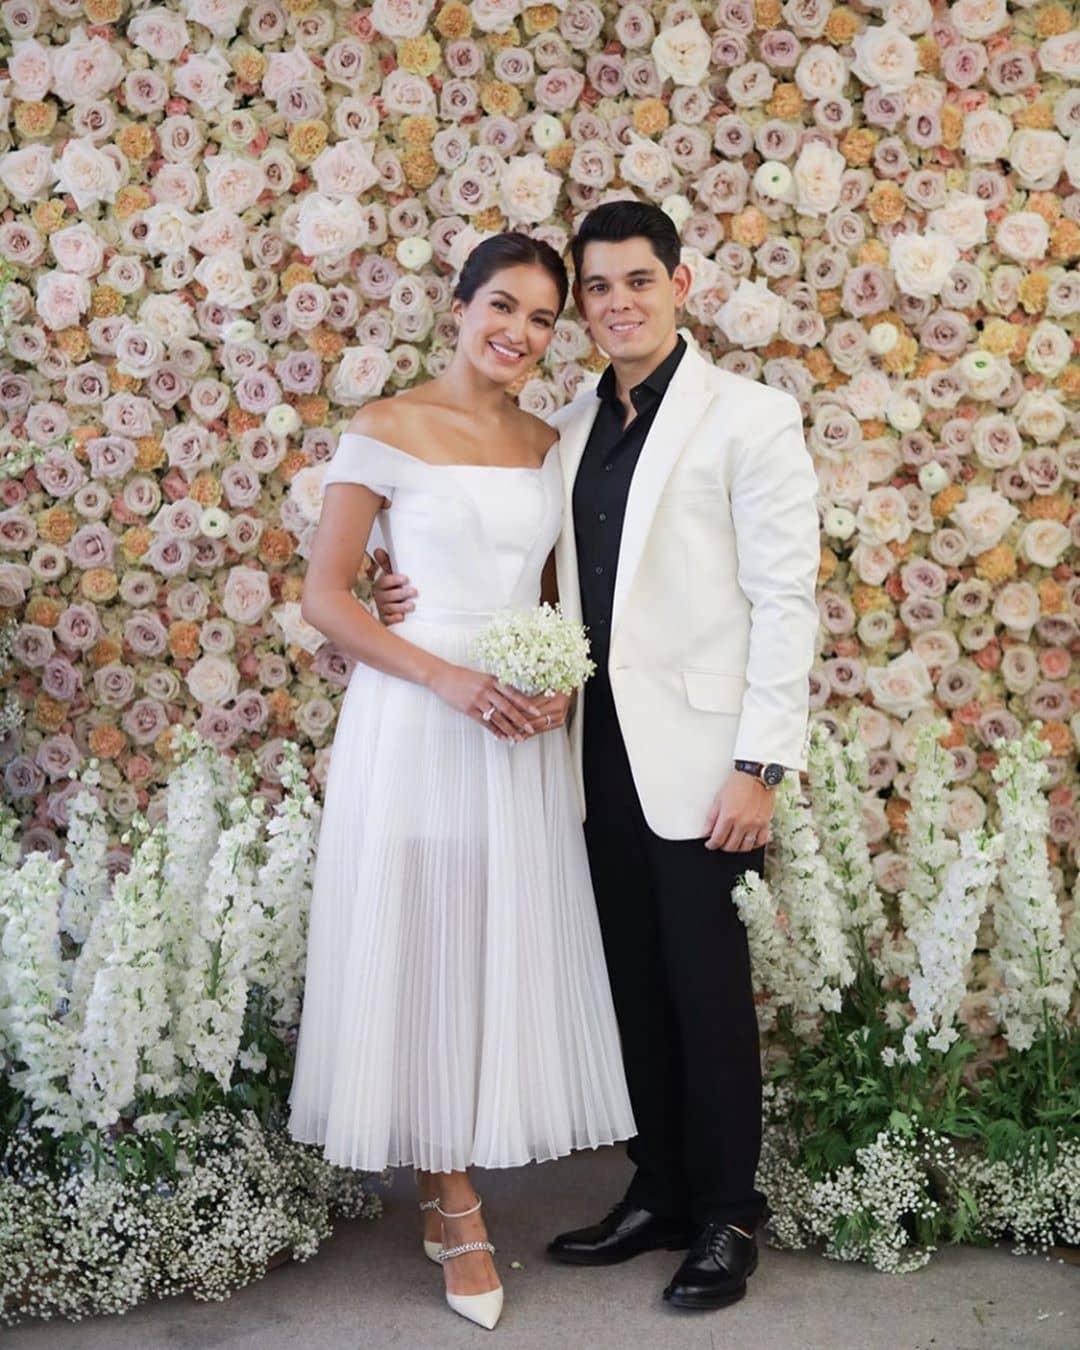 The newlyweds Mr. and Mrs. Gutierrez.